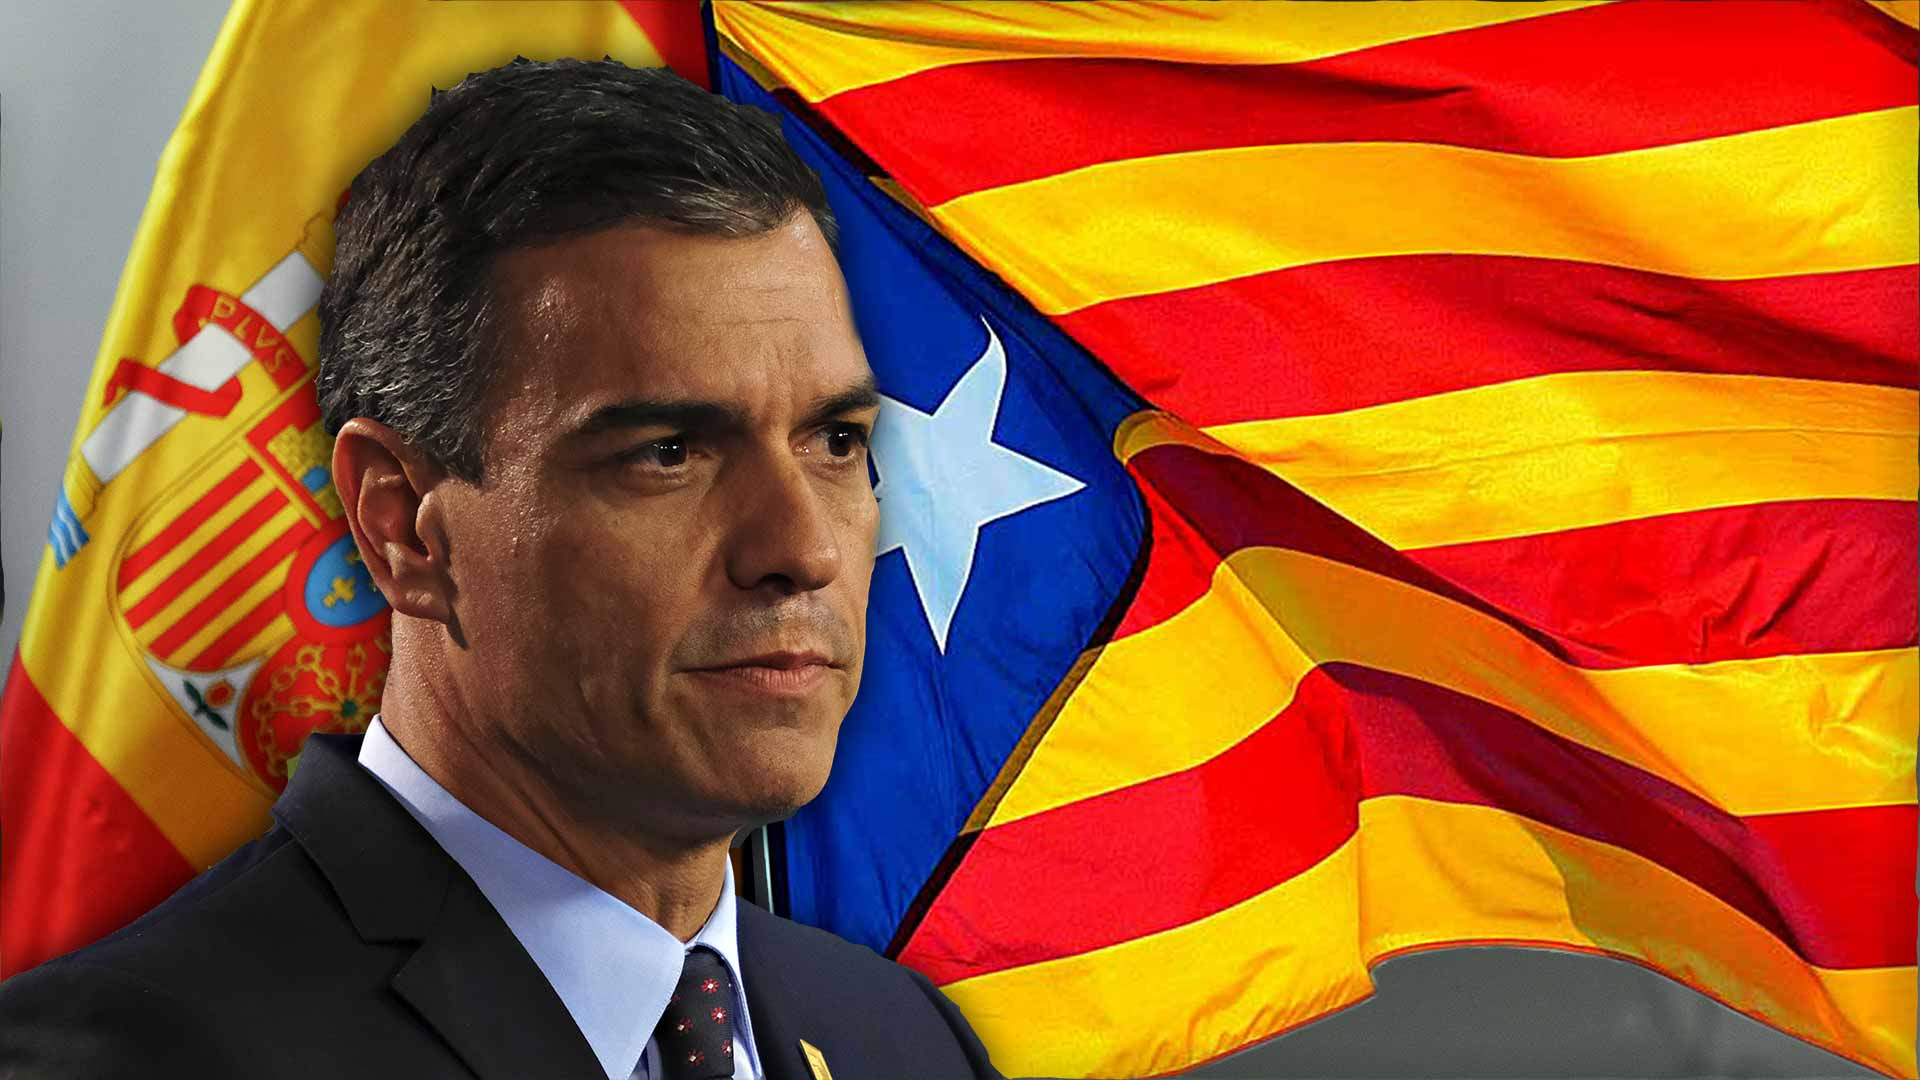 Prime Minister Pedro Sanchez